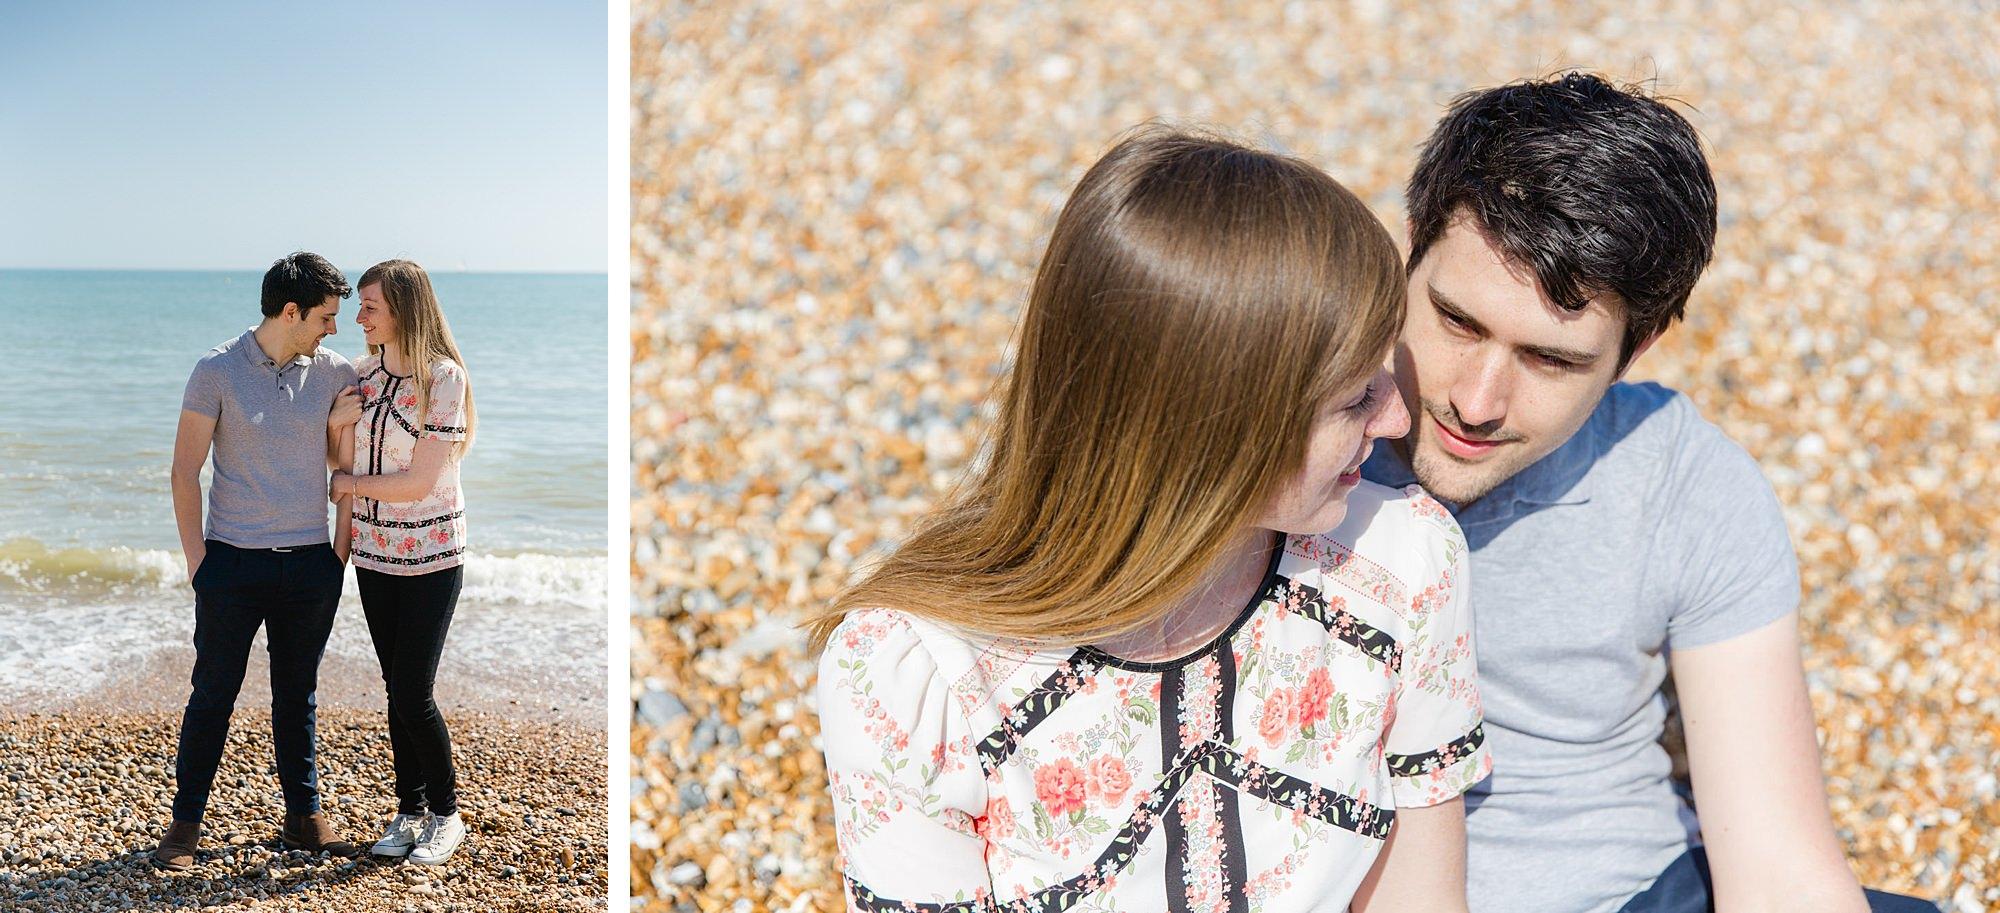 Fun Brighton engagement shoot couple on brighton beach